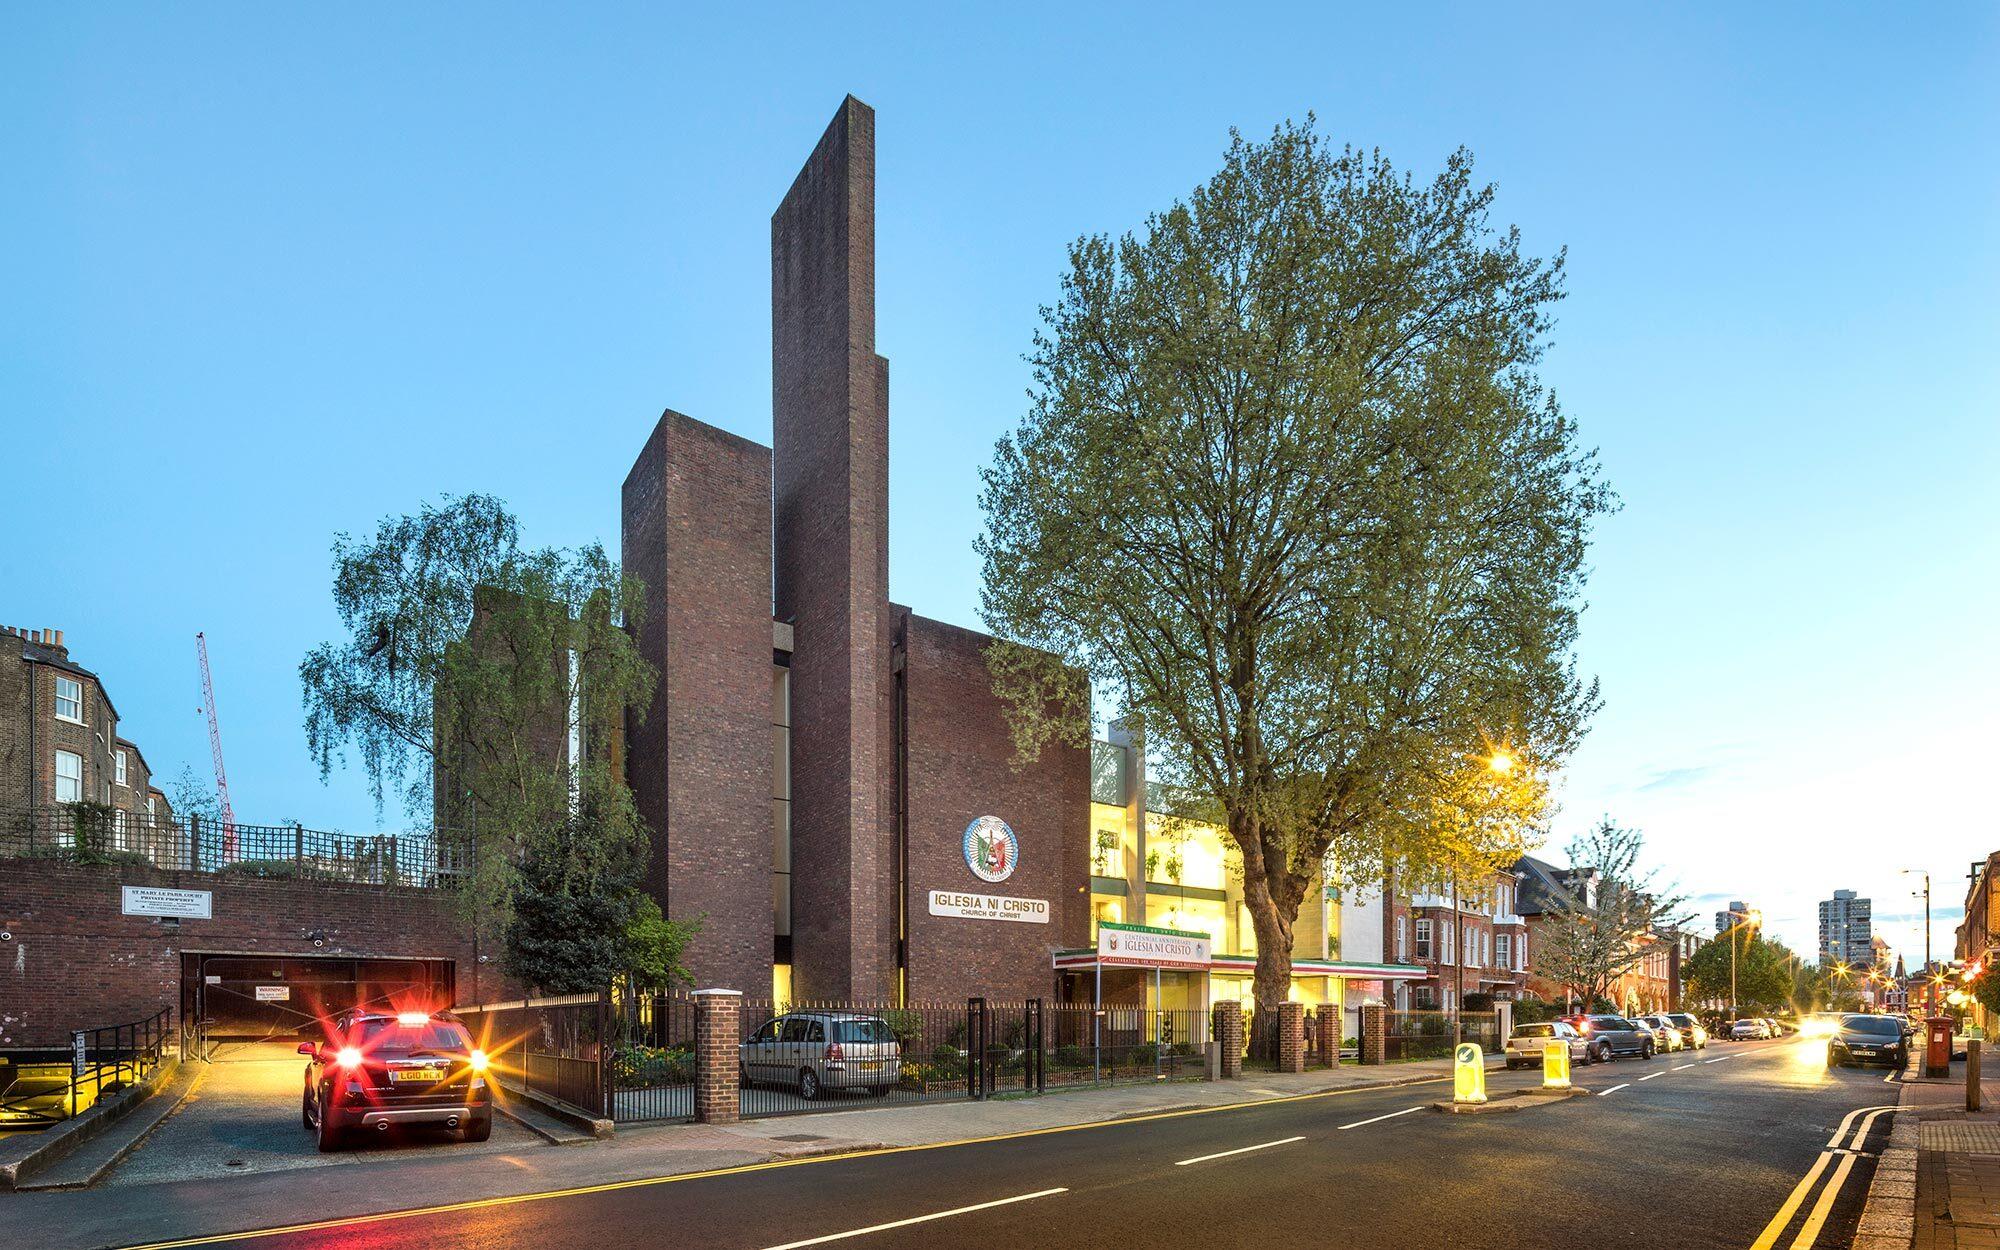 Igesia Ni Cristo, Battersea